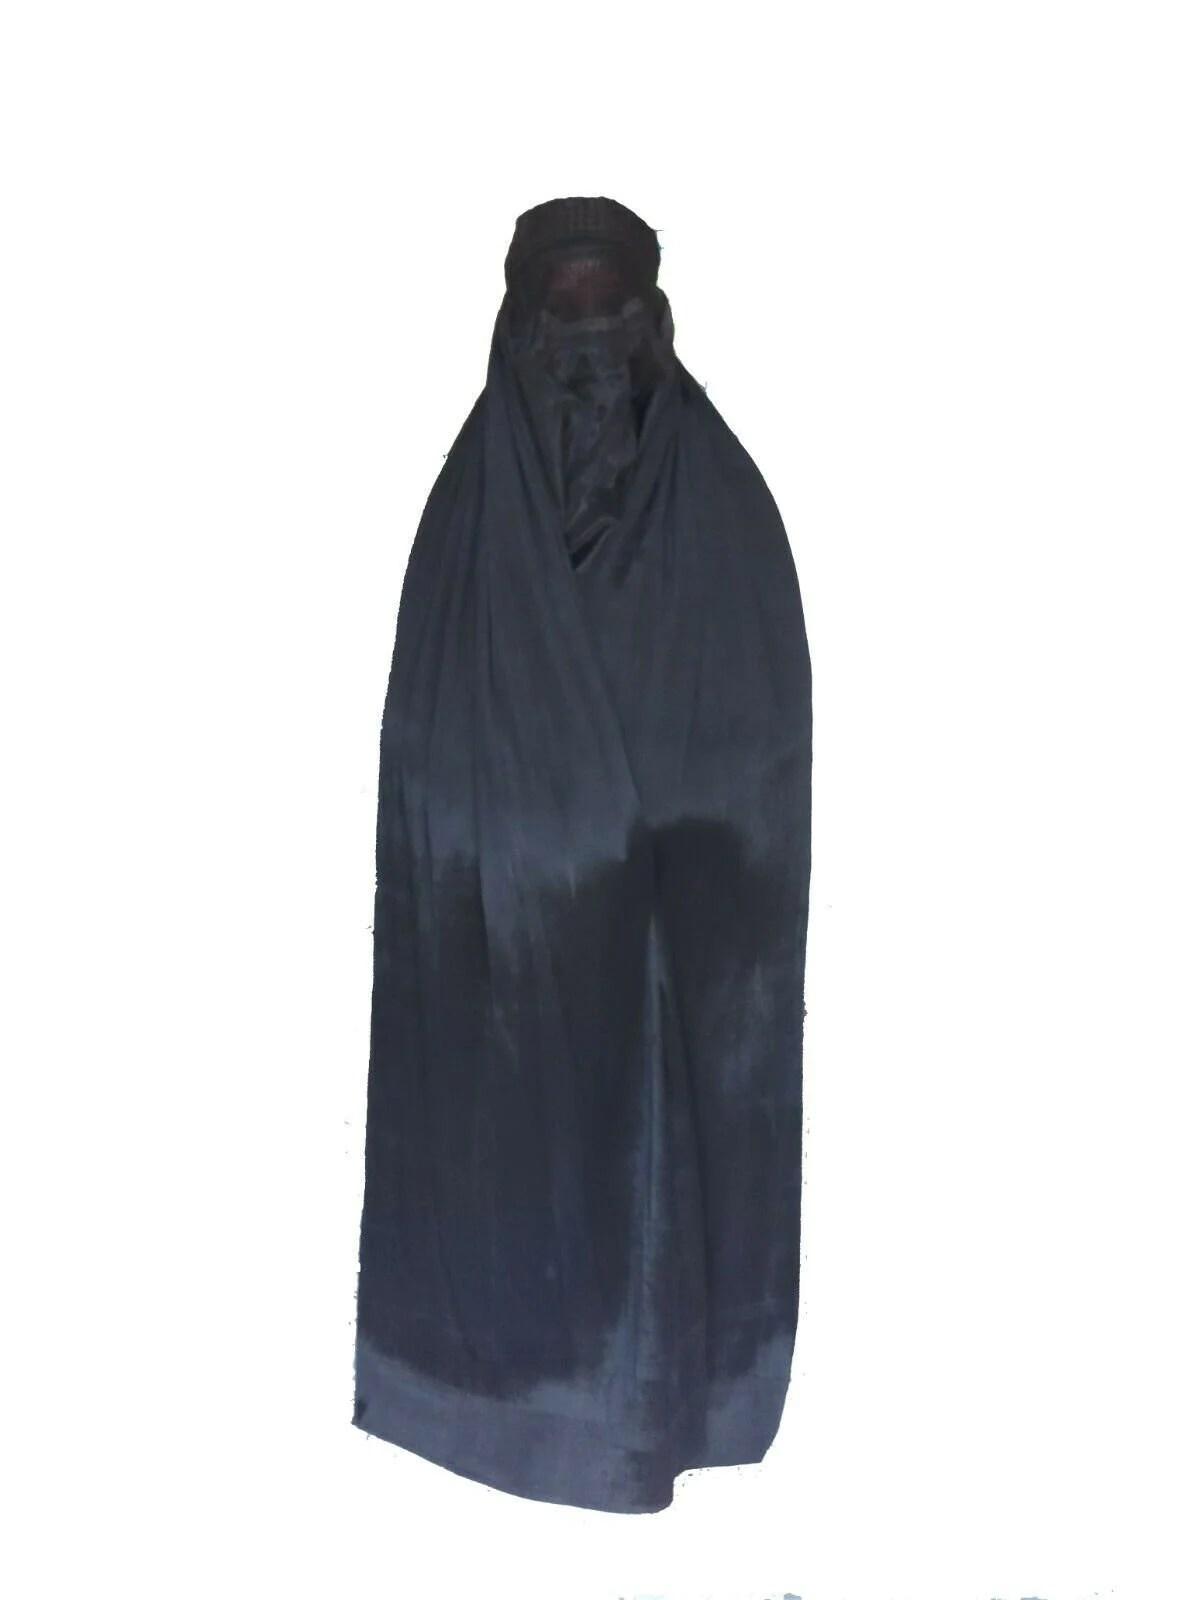 Women's islamic clothing · abaya. Burka Burqa Hijab Afghan Nomad Kuchi Bride Wedding Chador Etsy